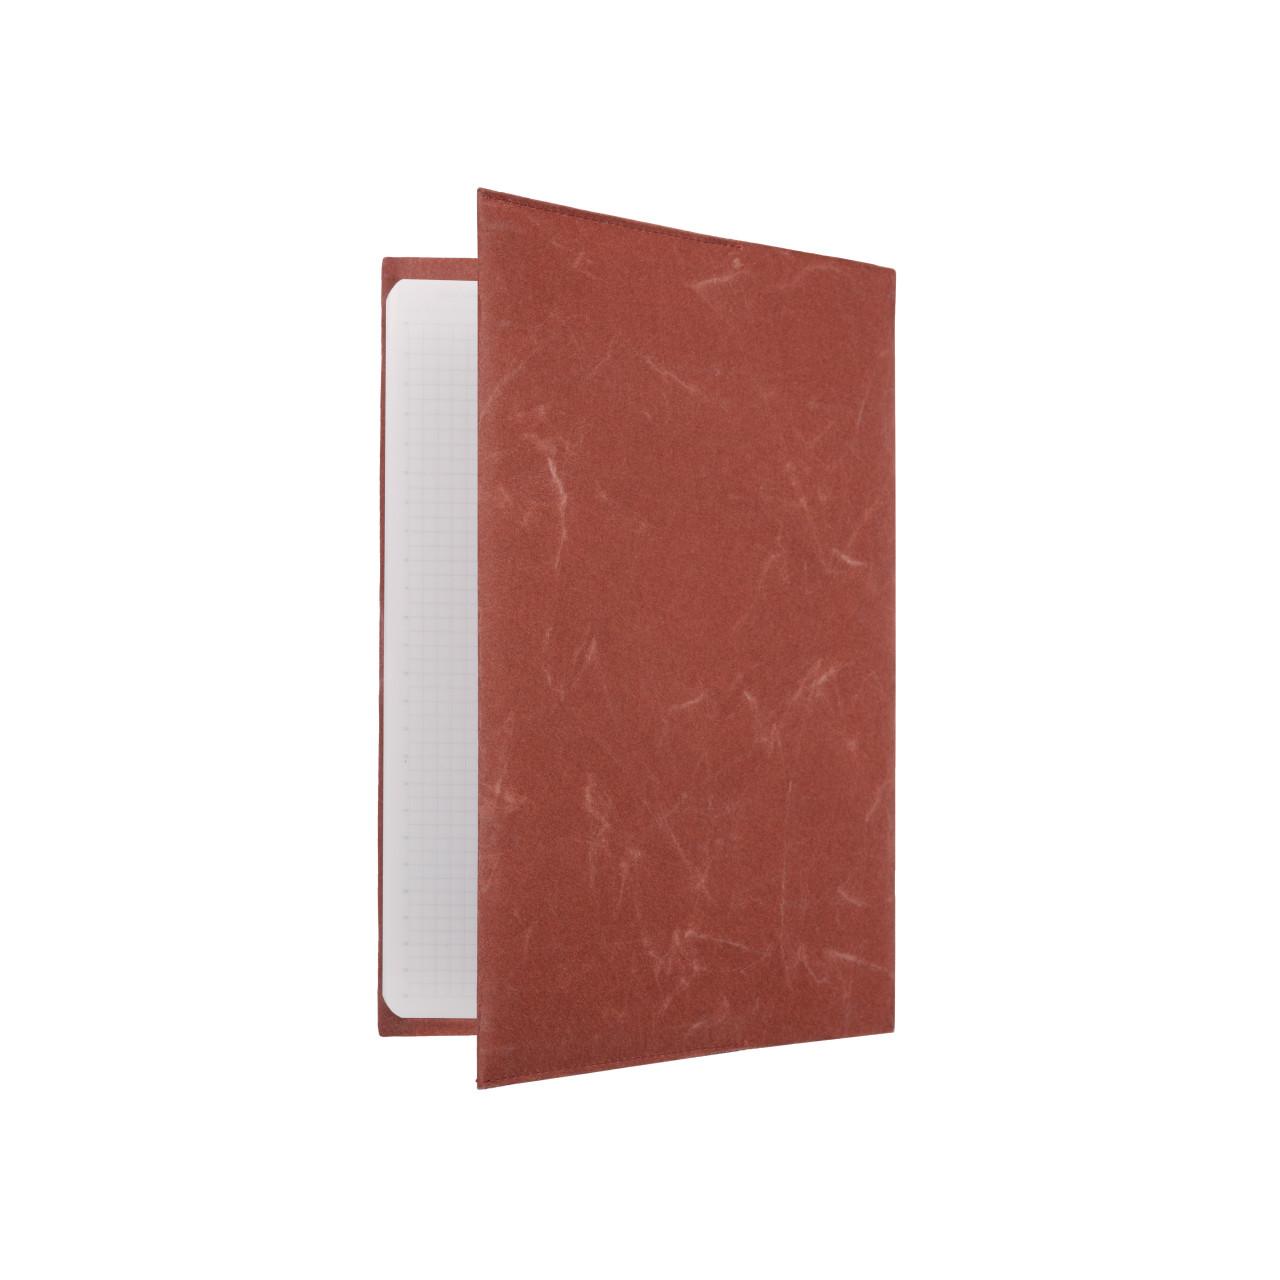 SIWA ブックカバー A5サイズ テラコッタ